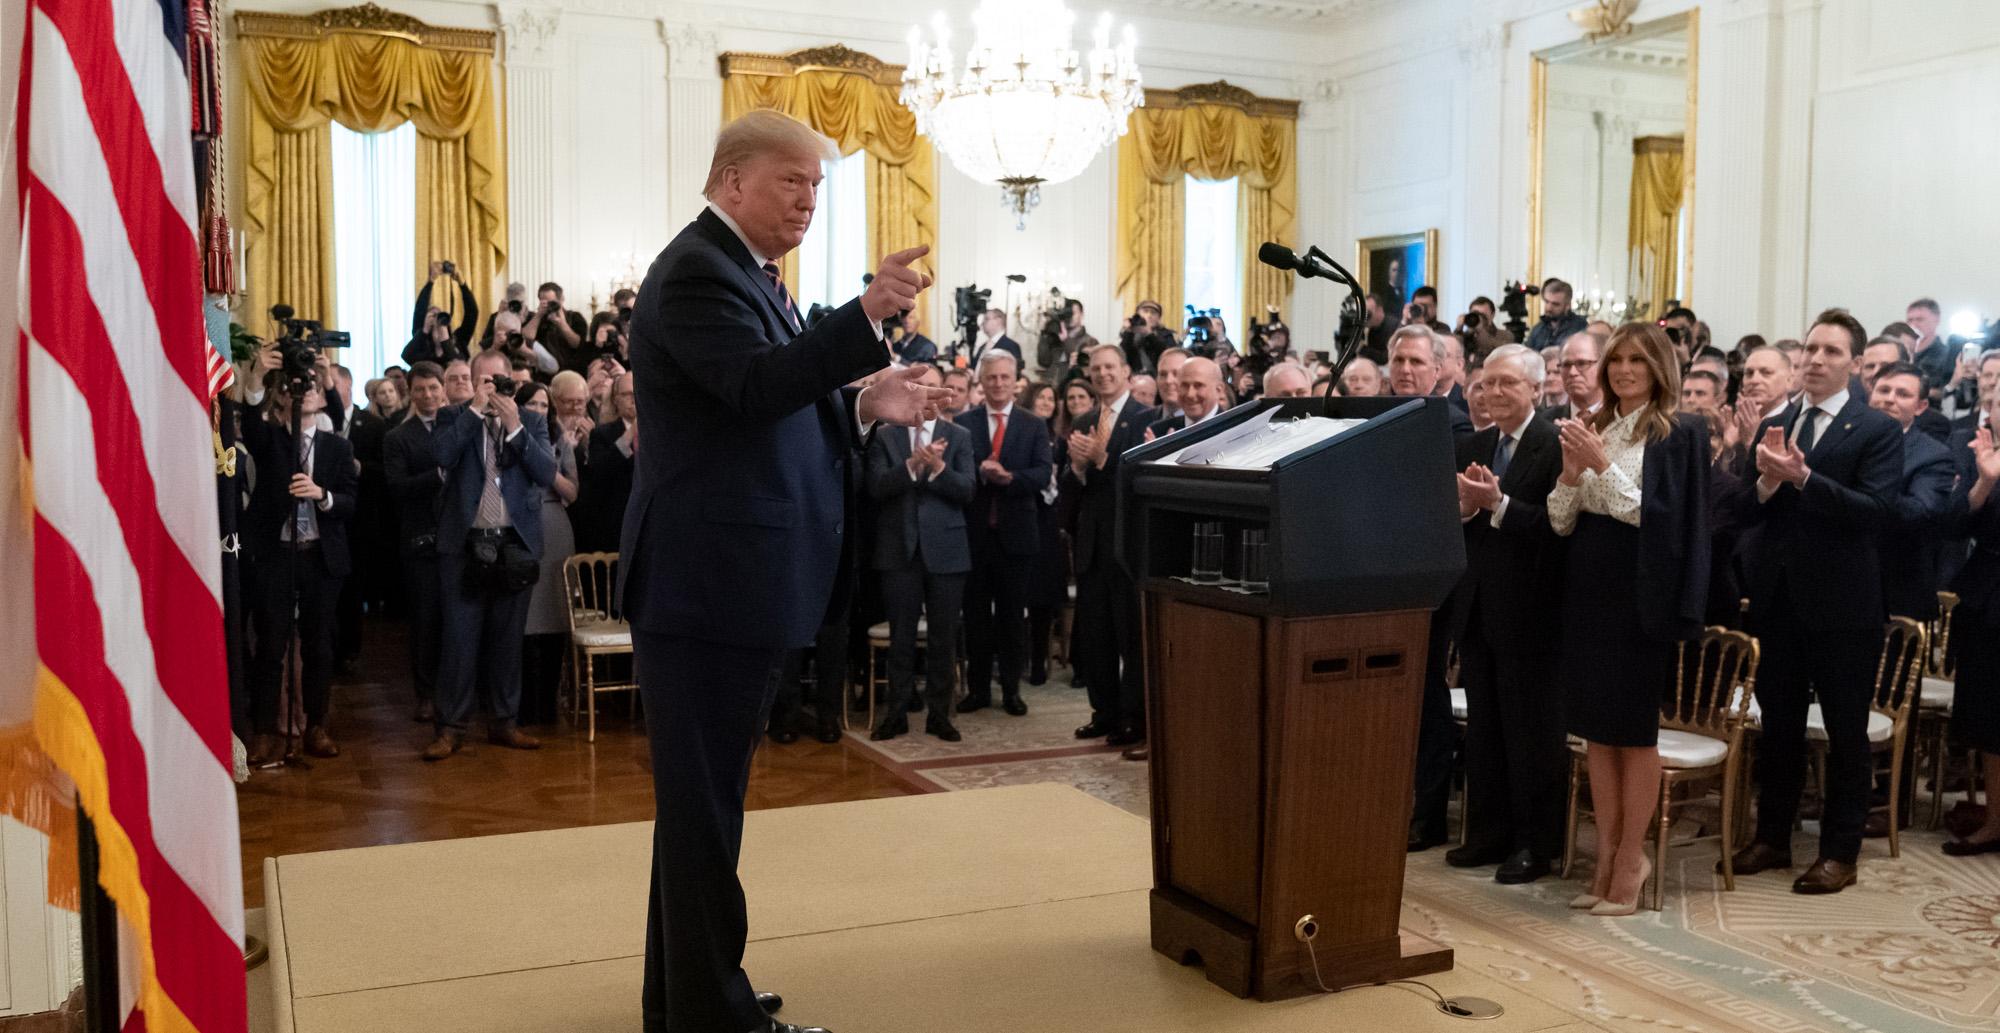 President_Trump_Delivers_Remarks 620-320